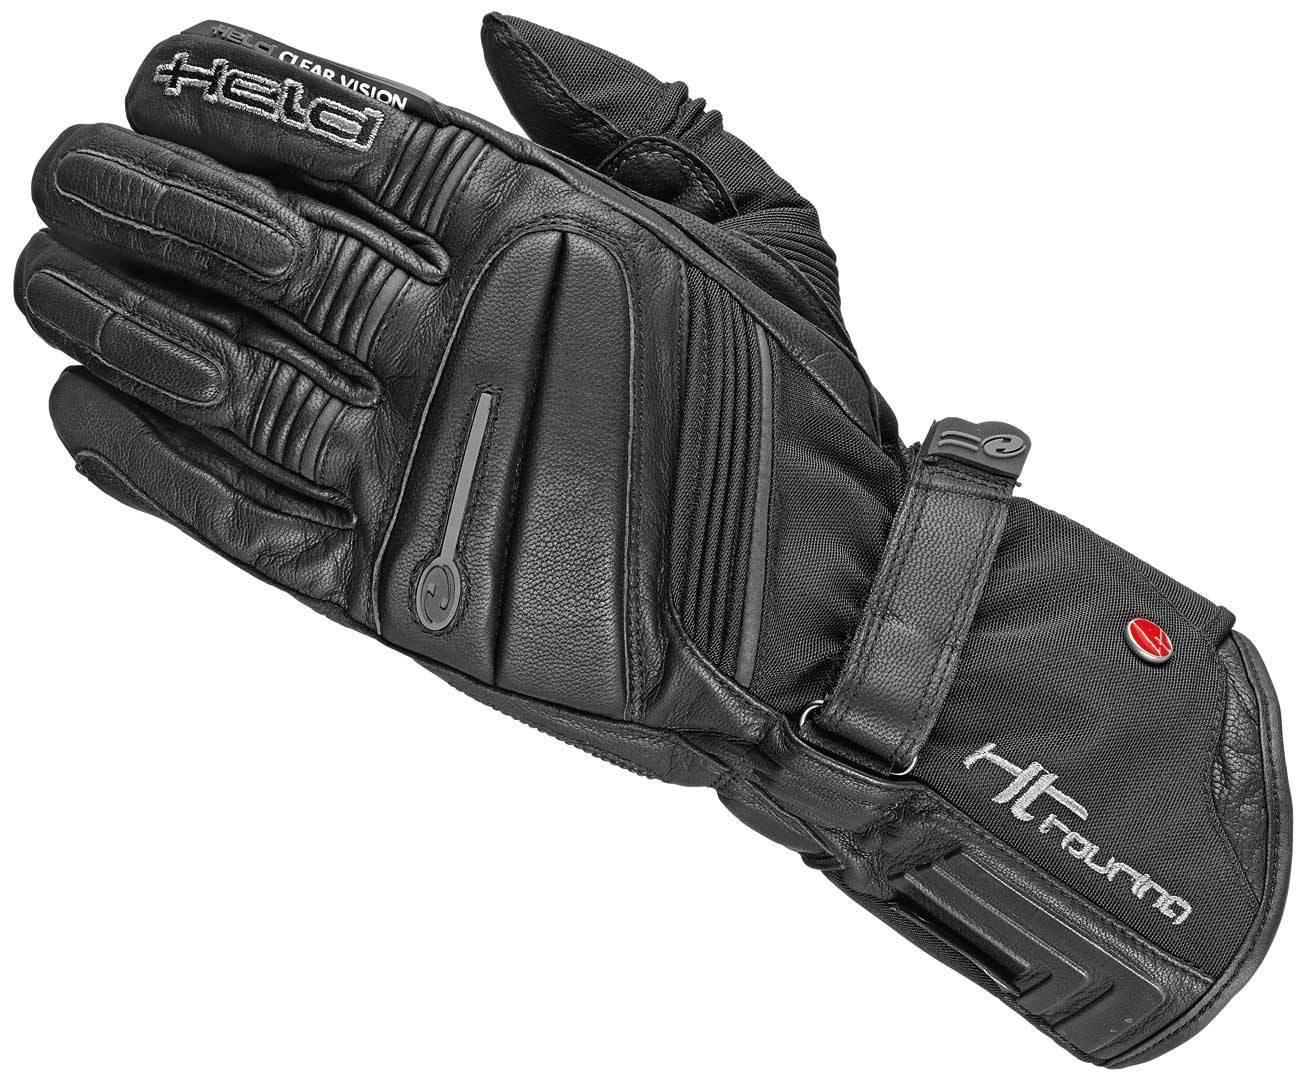 Held Wave Gore-Tex X-Trafit Motorradhandschuhe, schwarz-grau, Größe XS, schwarz-grau, Größe XS